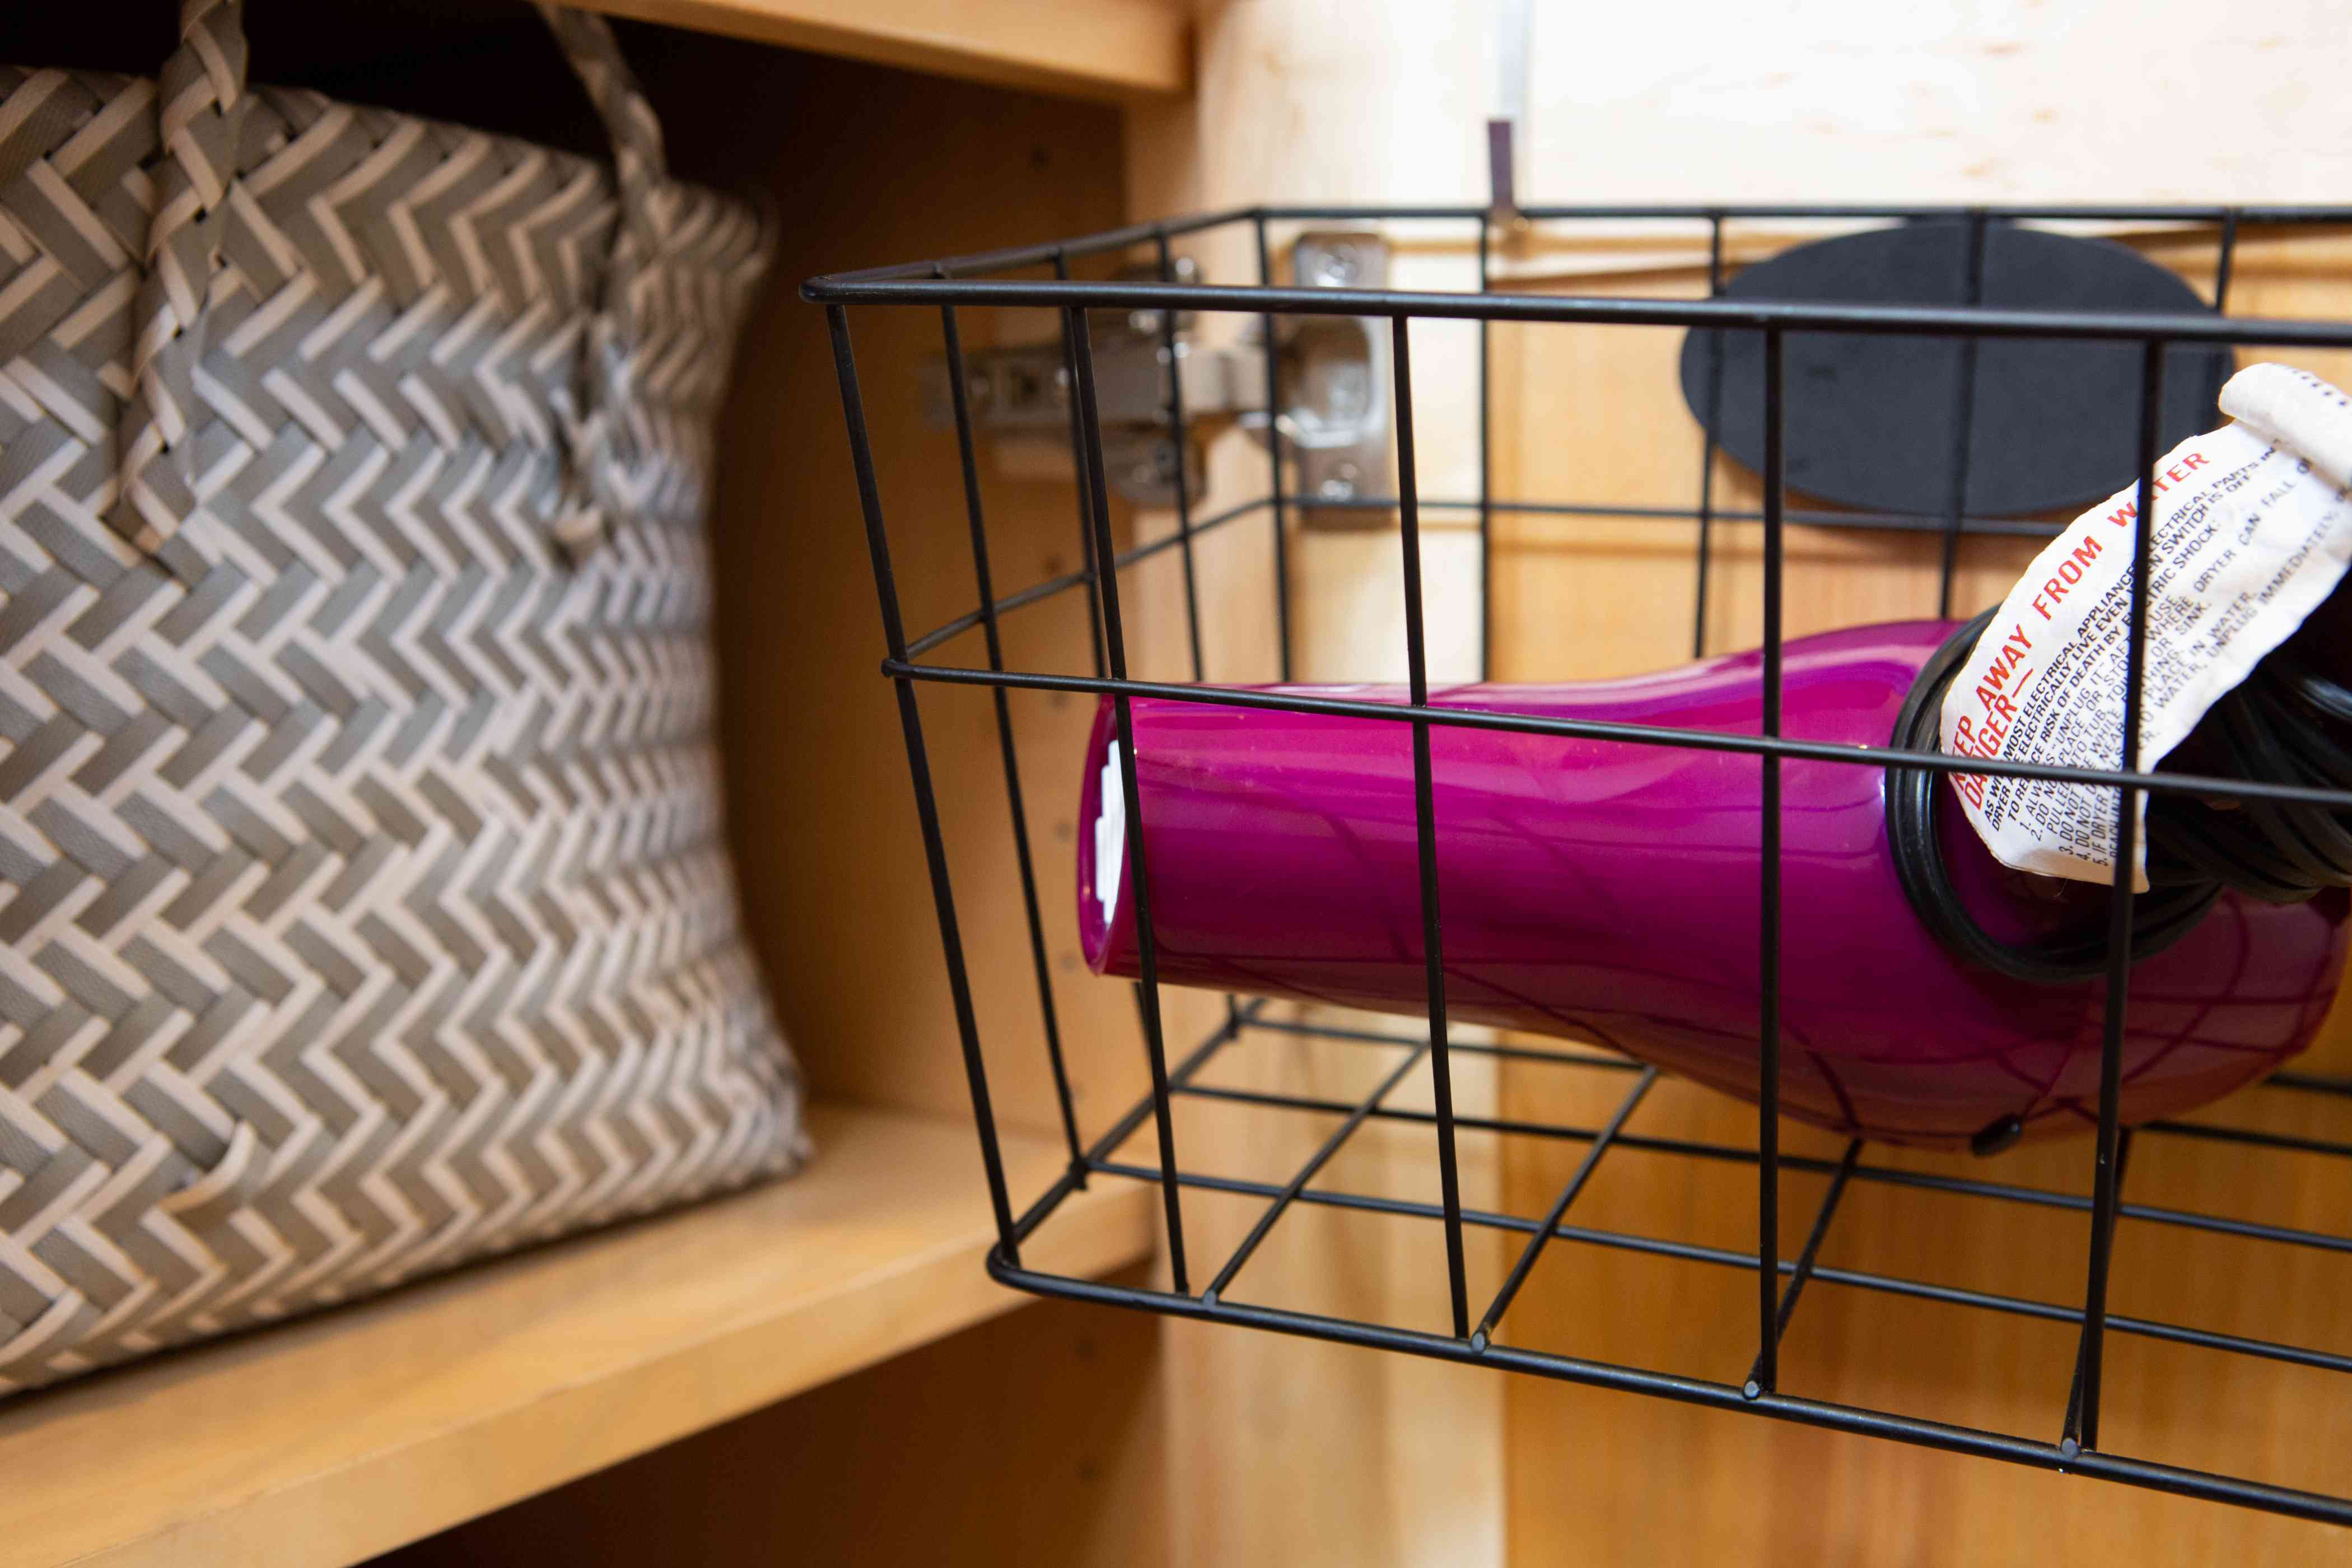 inner cabinet basket holding a hair dryer